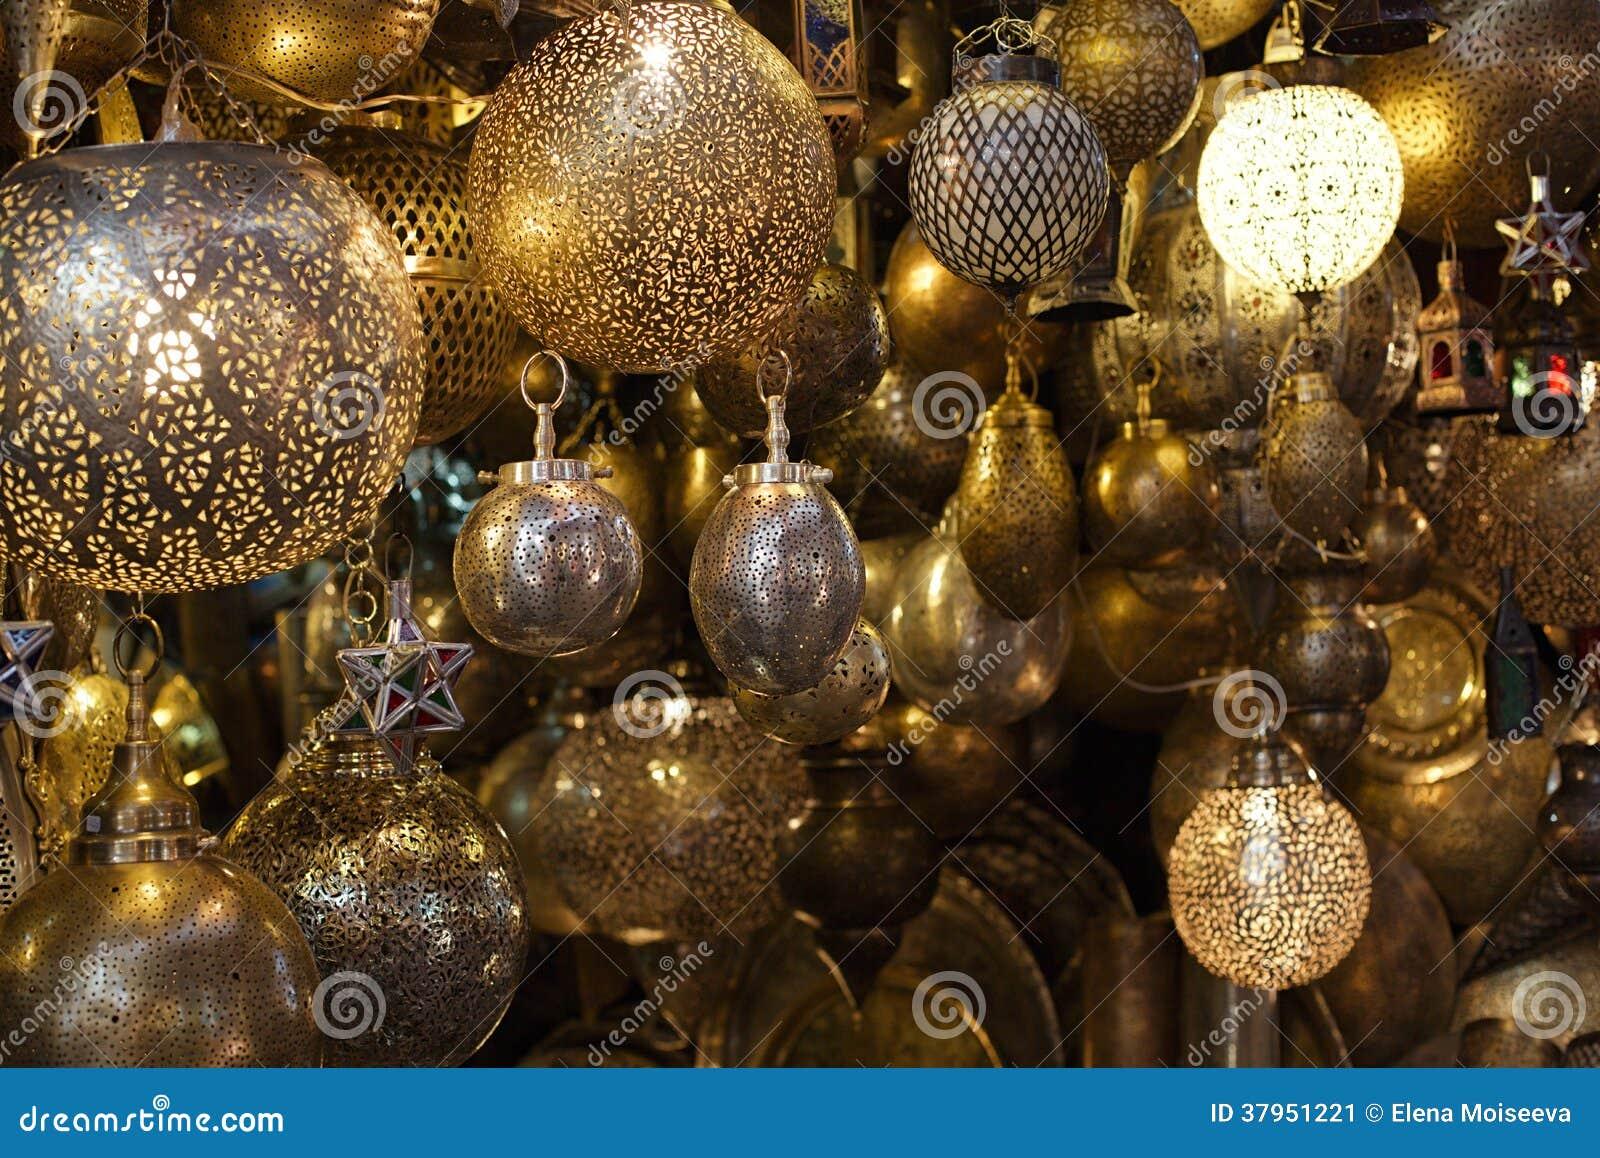 lampes marocaines de lanternes en verre et en m tal marrakech image stock image 37951221. Black Bedroom Furniture Sets. Home Design Ideas